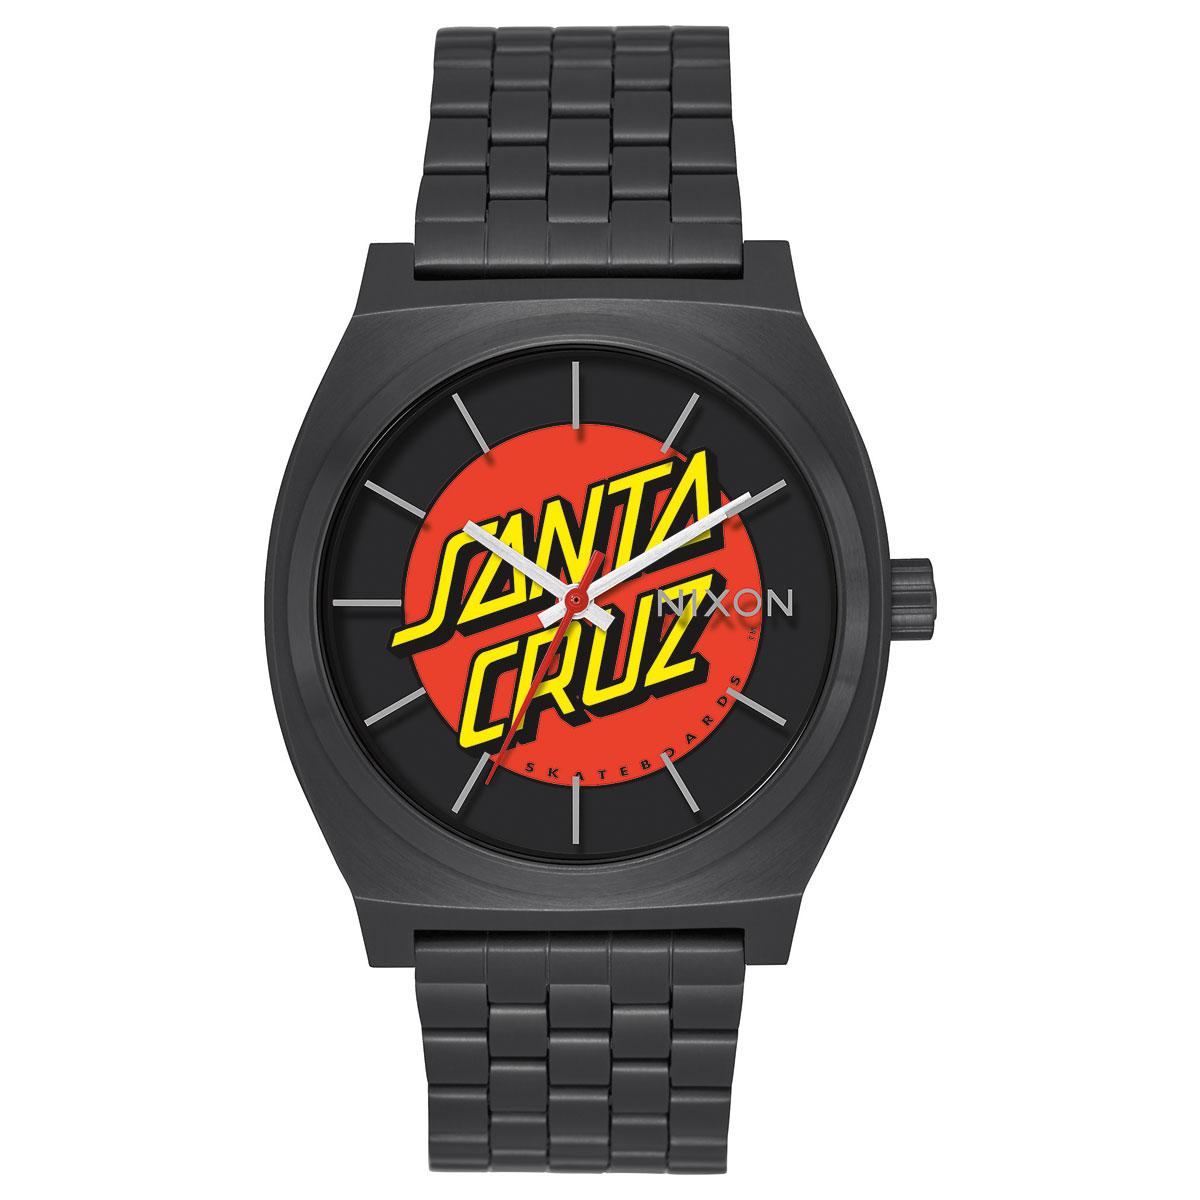 NIXON TIME TELLER(ニクソン タイム テラー サンタクルーズ)BLACK/SANTA CRUZ【メンズ レディース 腕時計】17HO-I